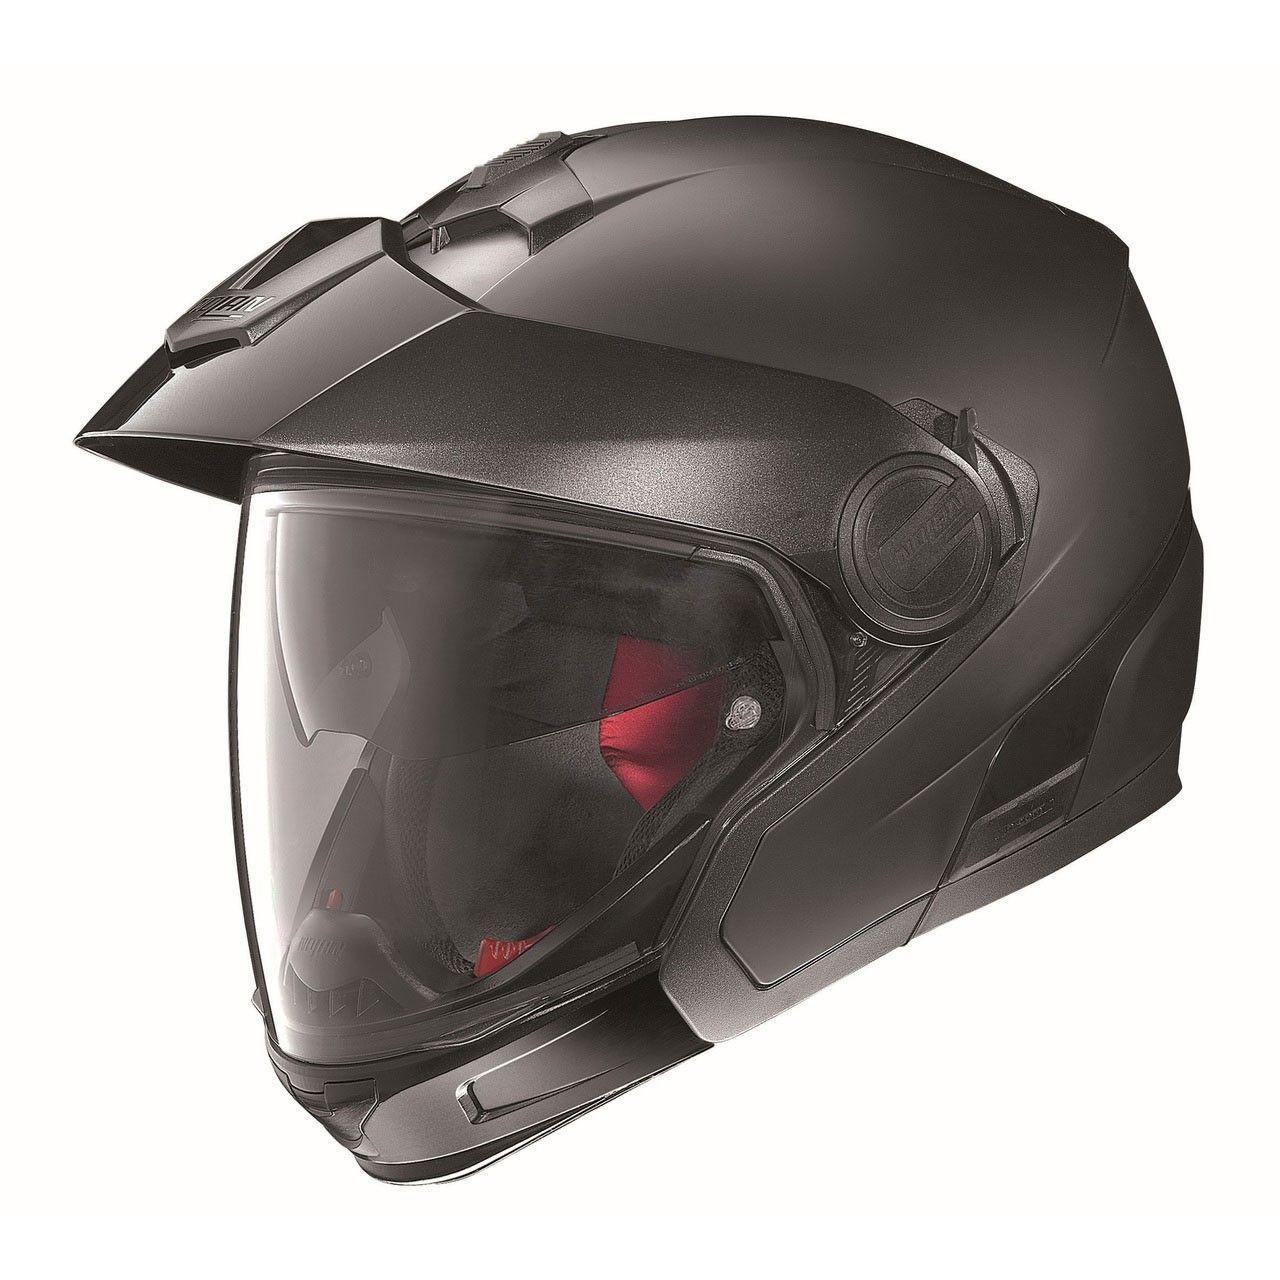 Nolan N40 Full Helmet with MCS II Headset Black